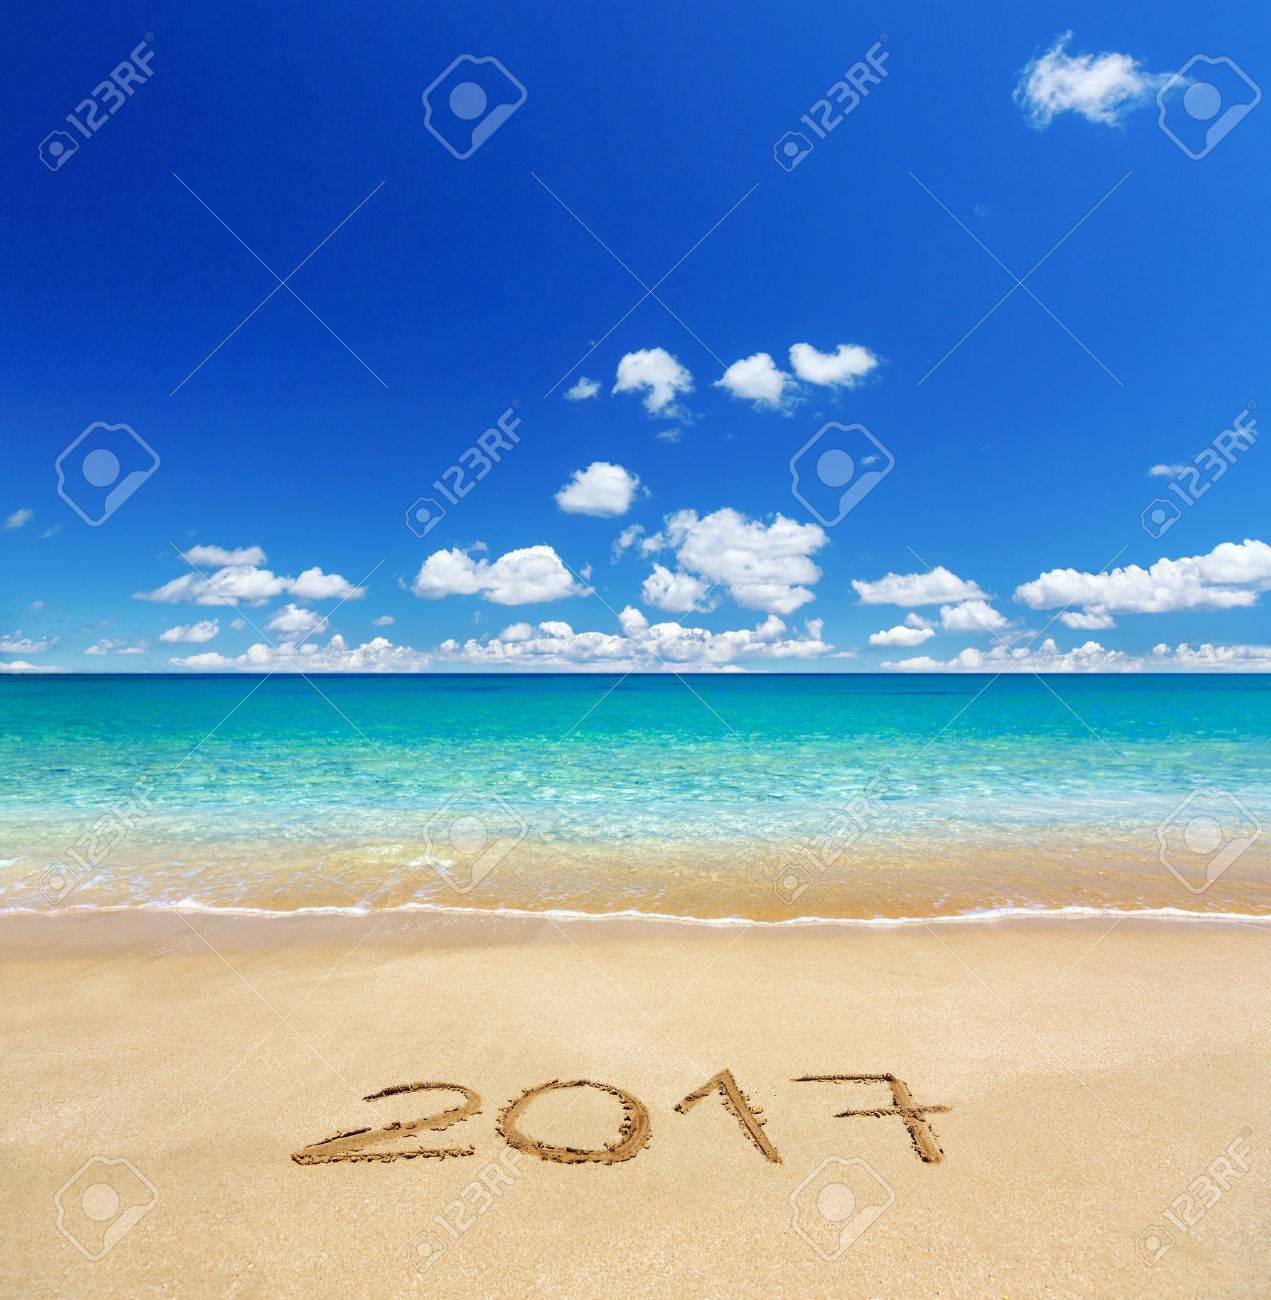 2017 written on sandy beach - 63676401